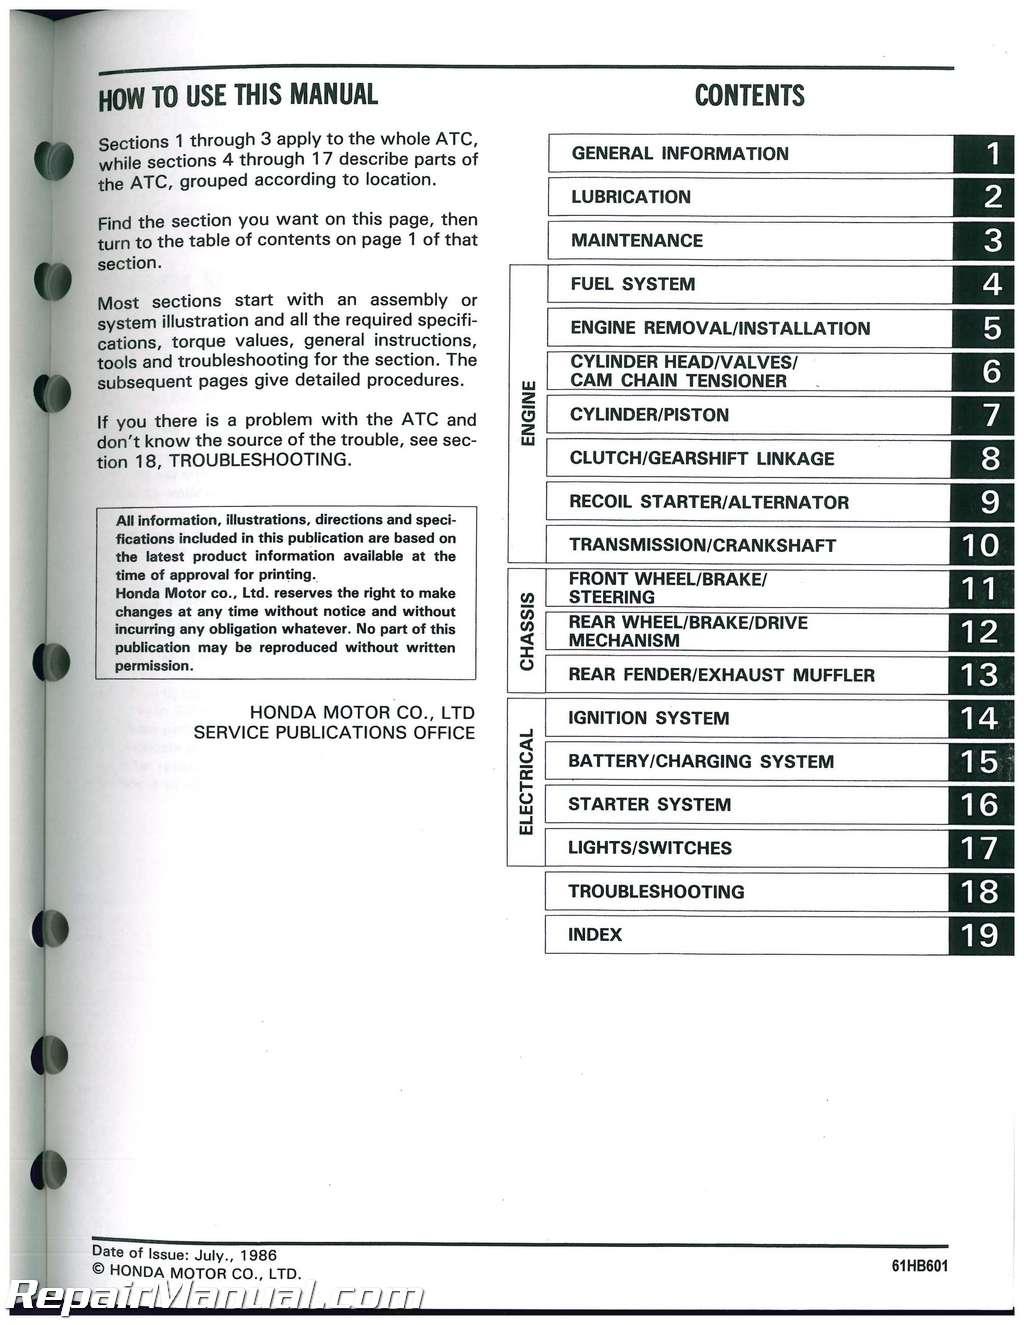 1986 1987 honda atc125m three wheeler service manual honda rancher 420 atv wiring diagram #14